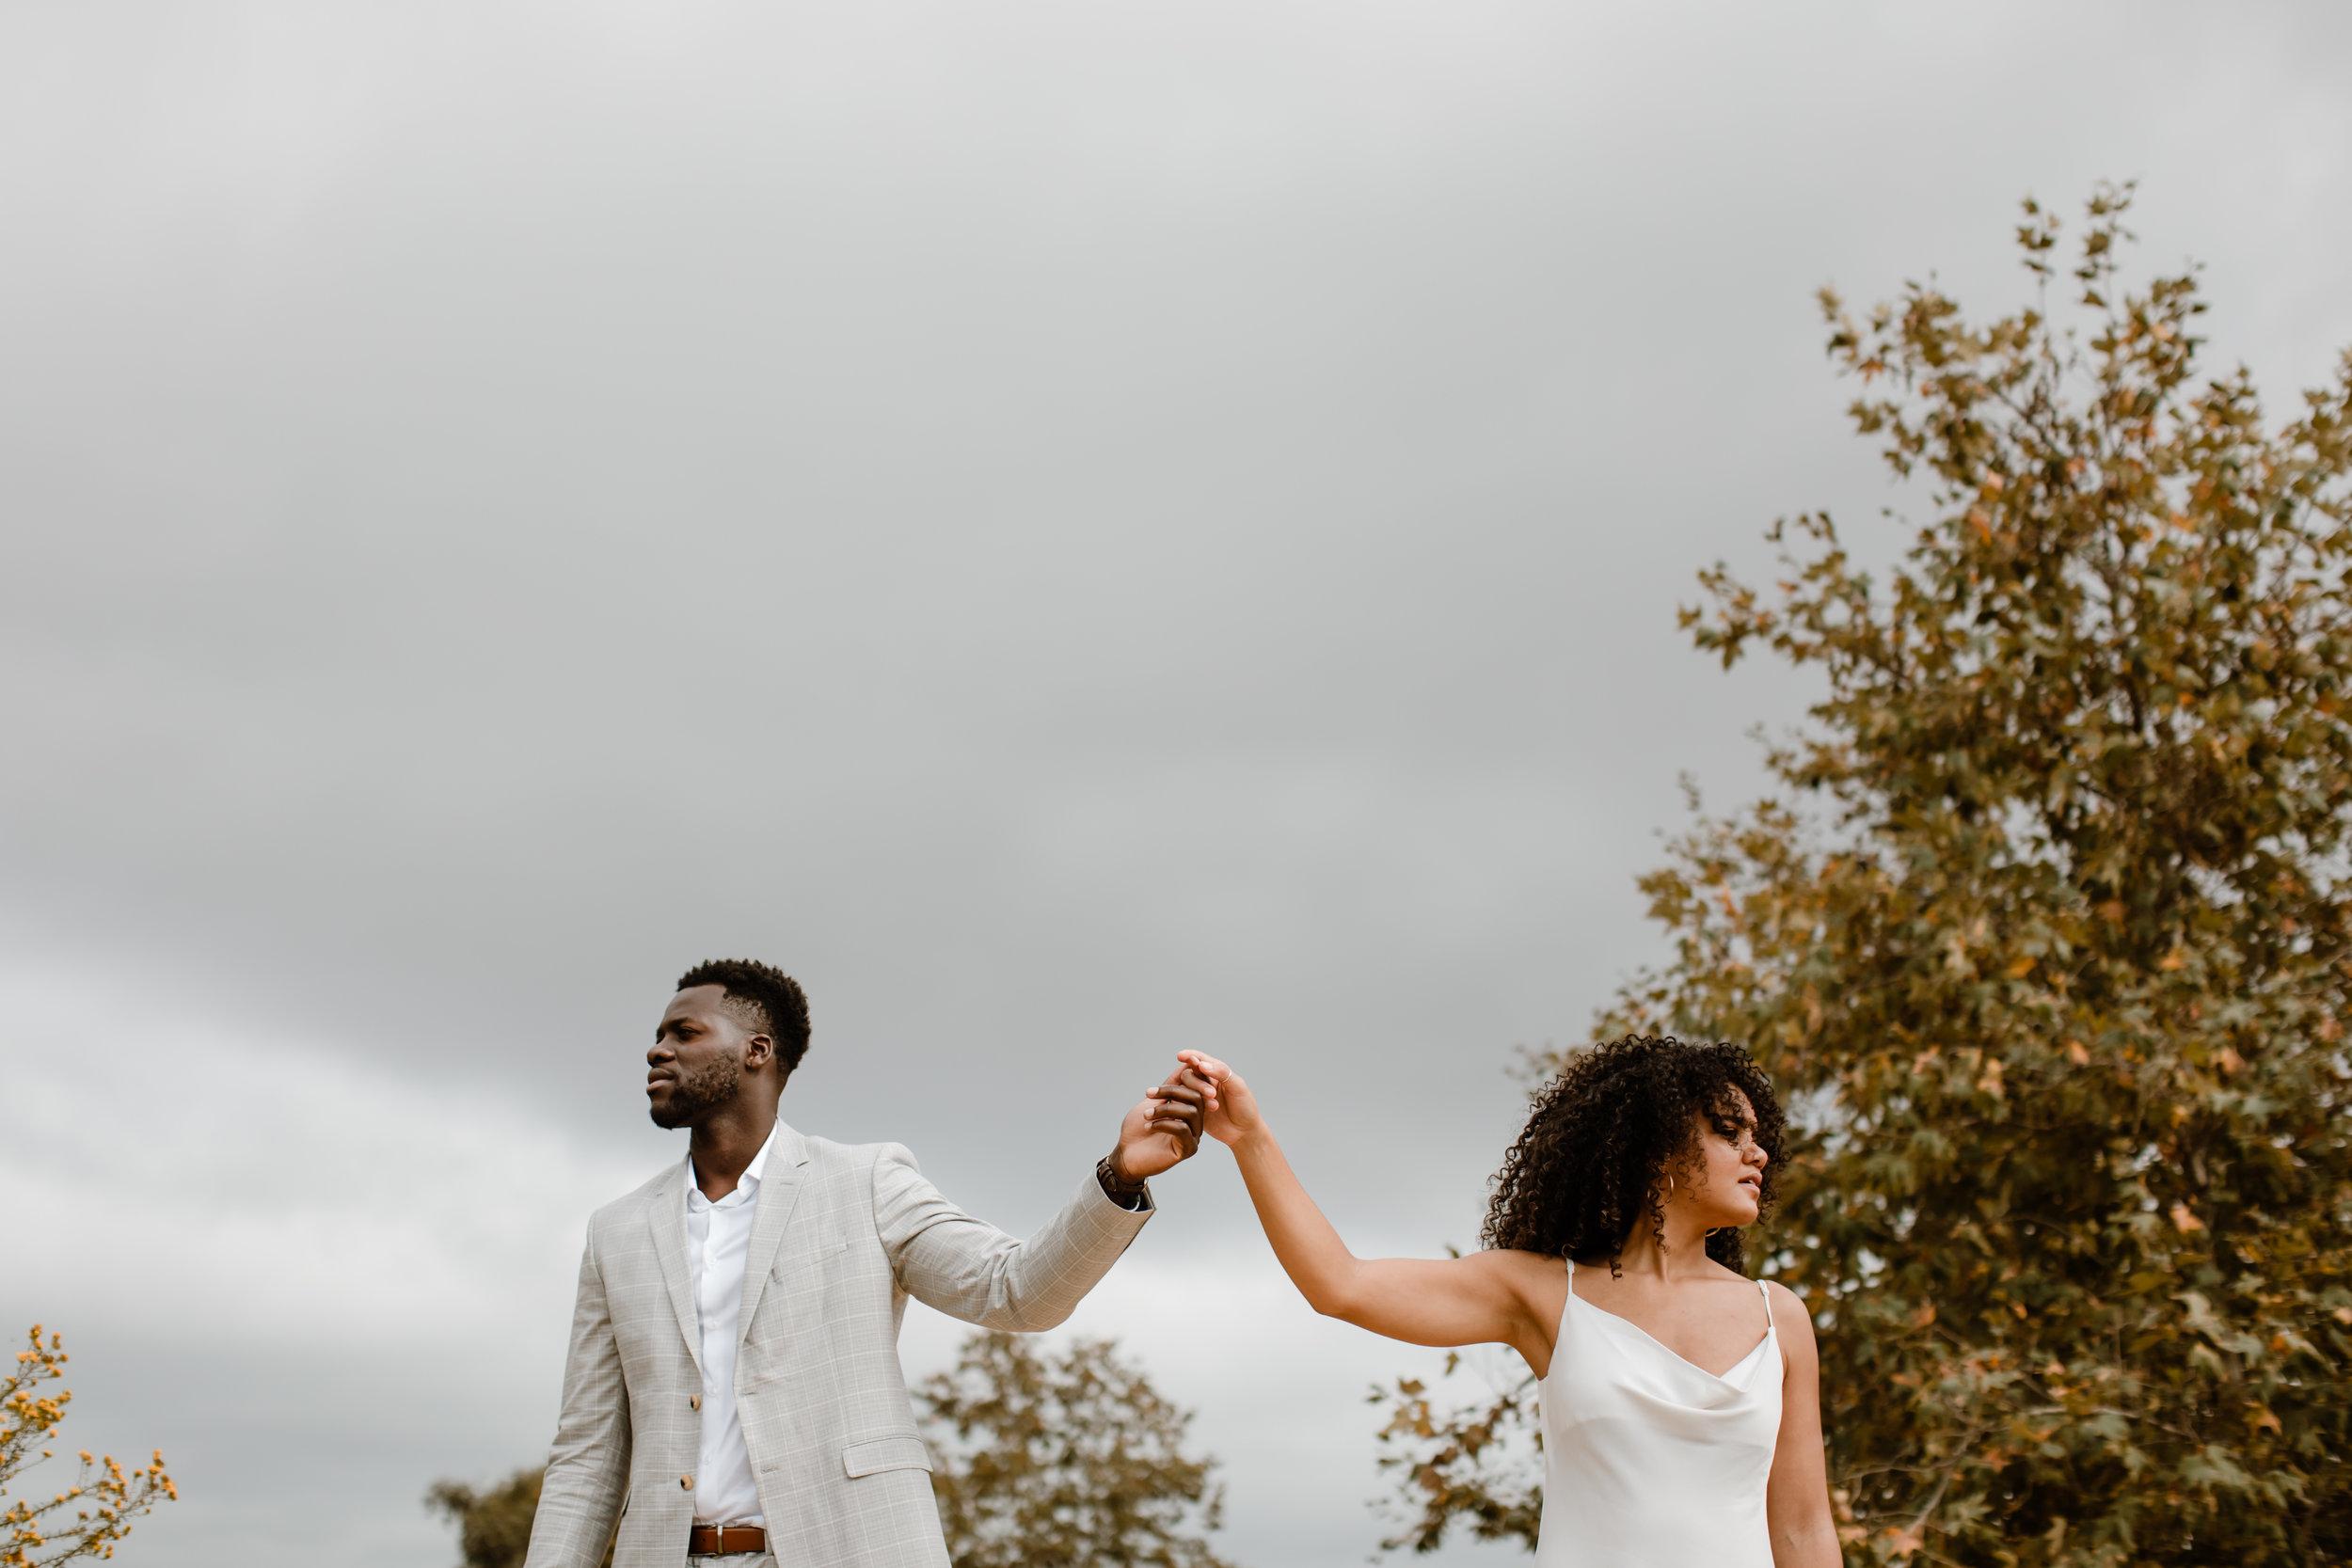 Laure and Boris Orange County Wedding - Eve Rox Photography-20.jpg